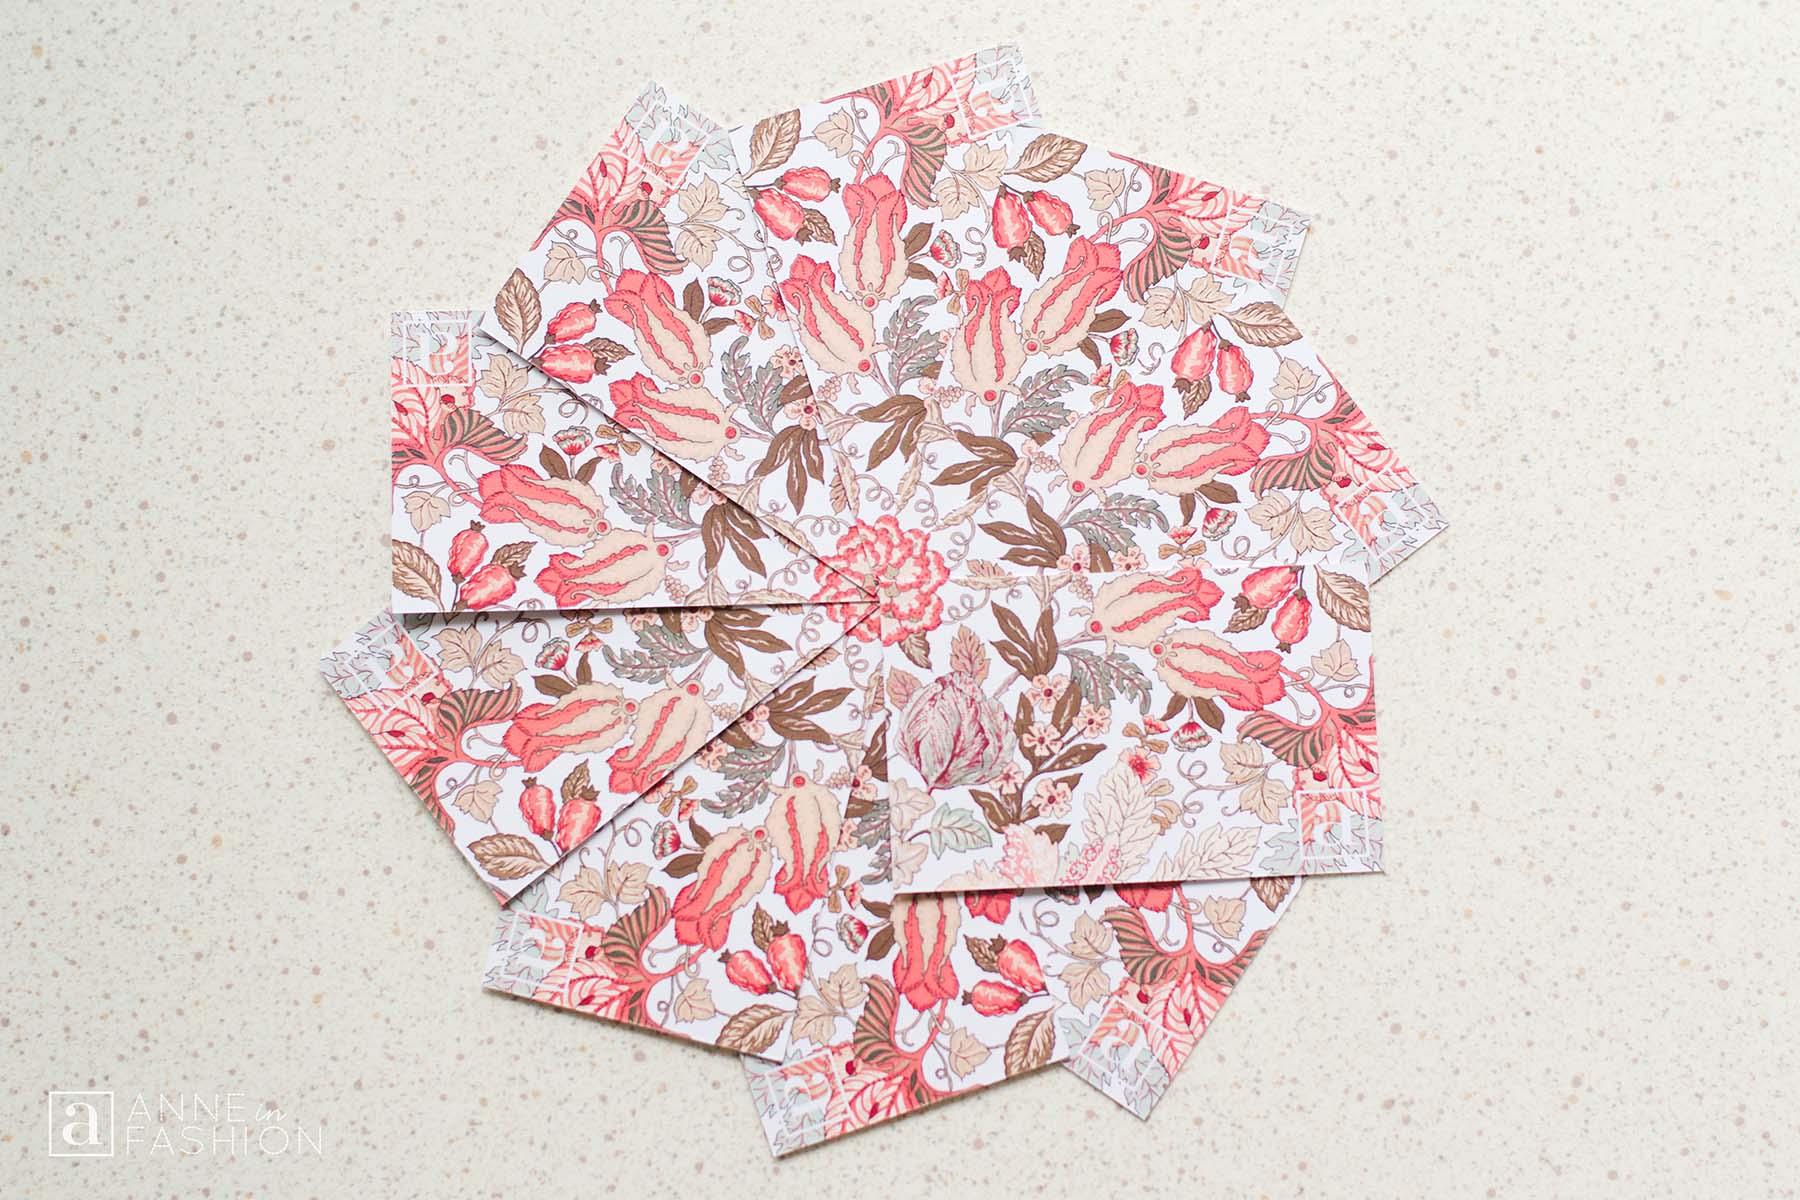 Marketing Ephemera: Designing ANNE in FASHION\'s Business Cards ...